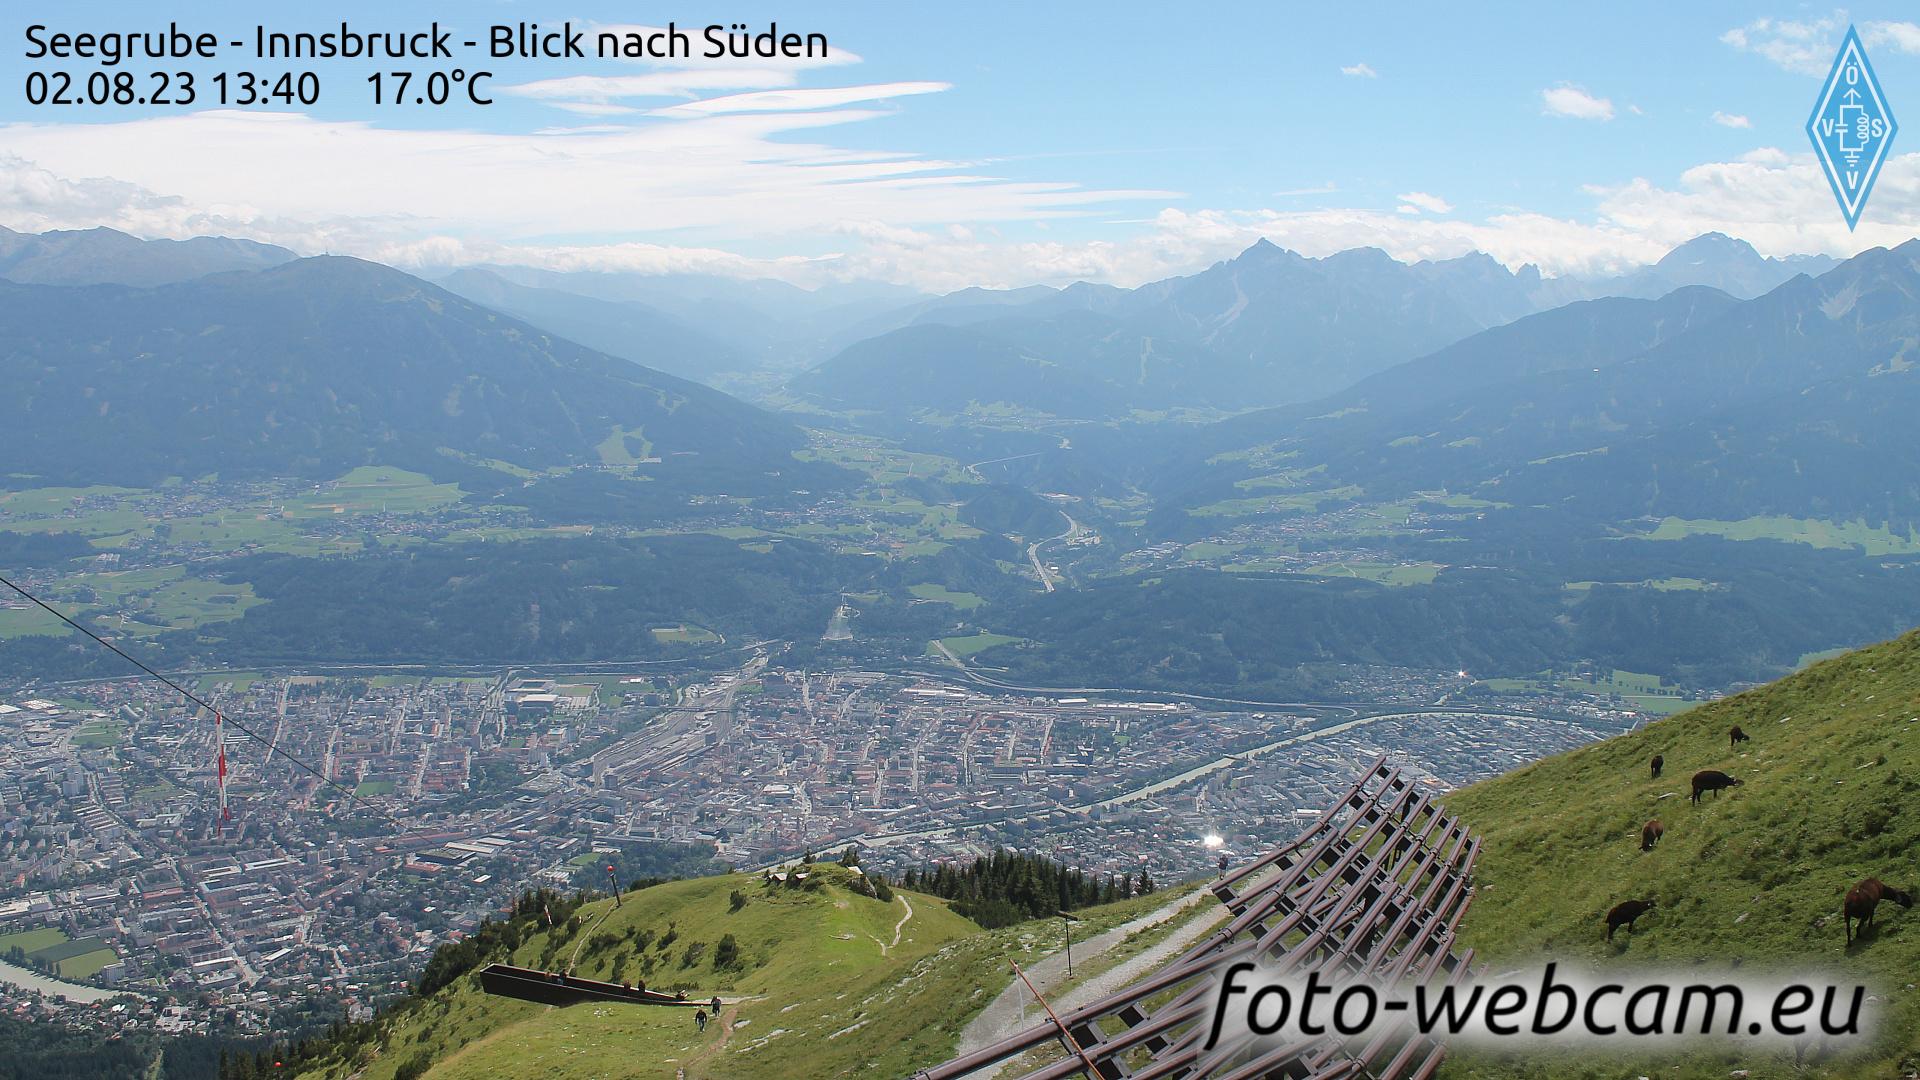 Innsbruck Wed. 13:18